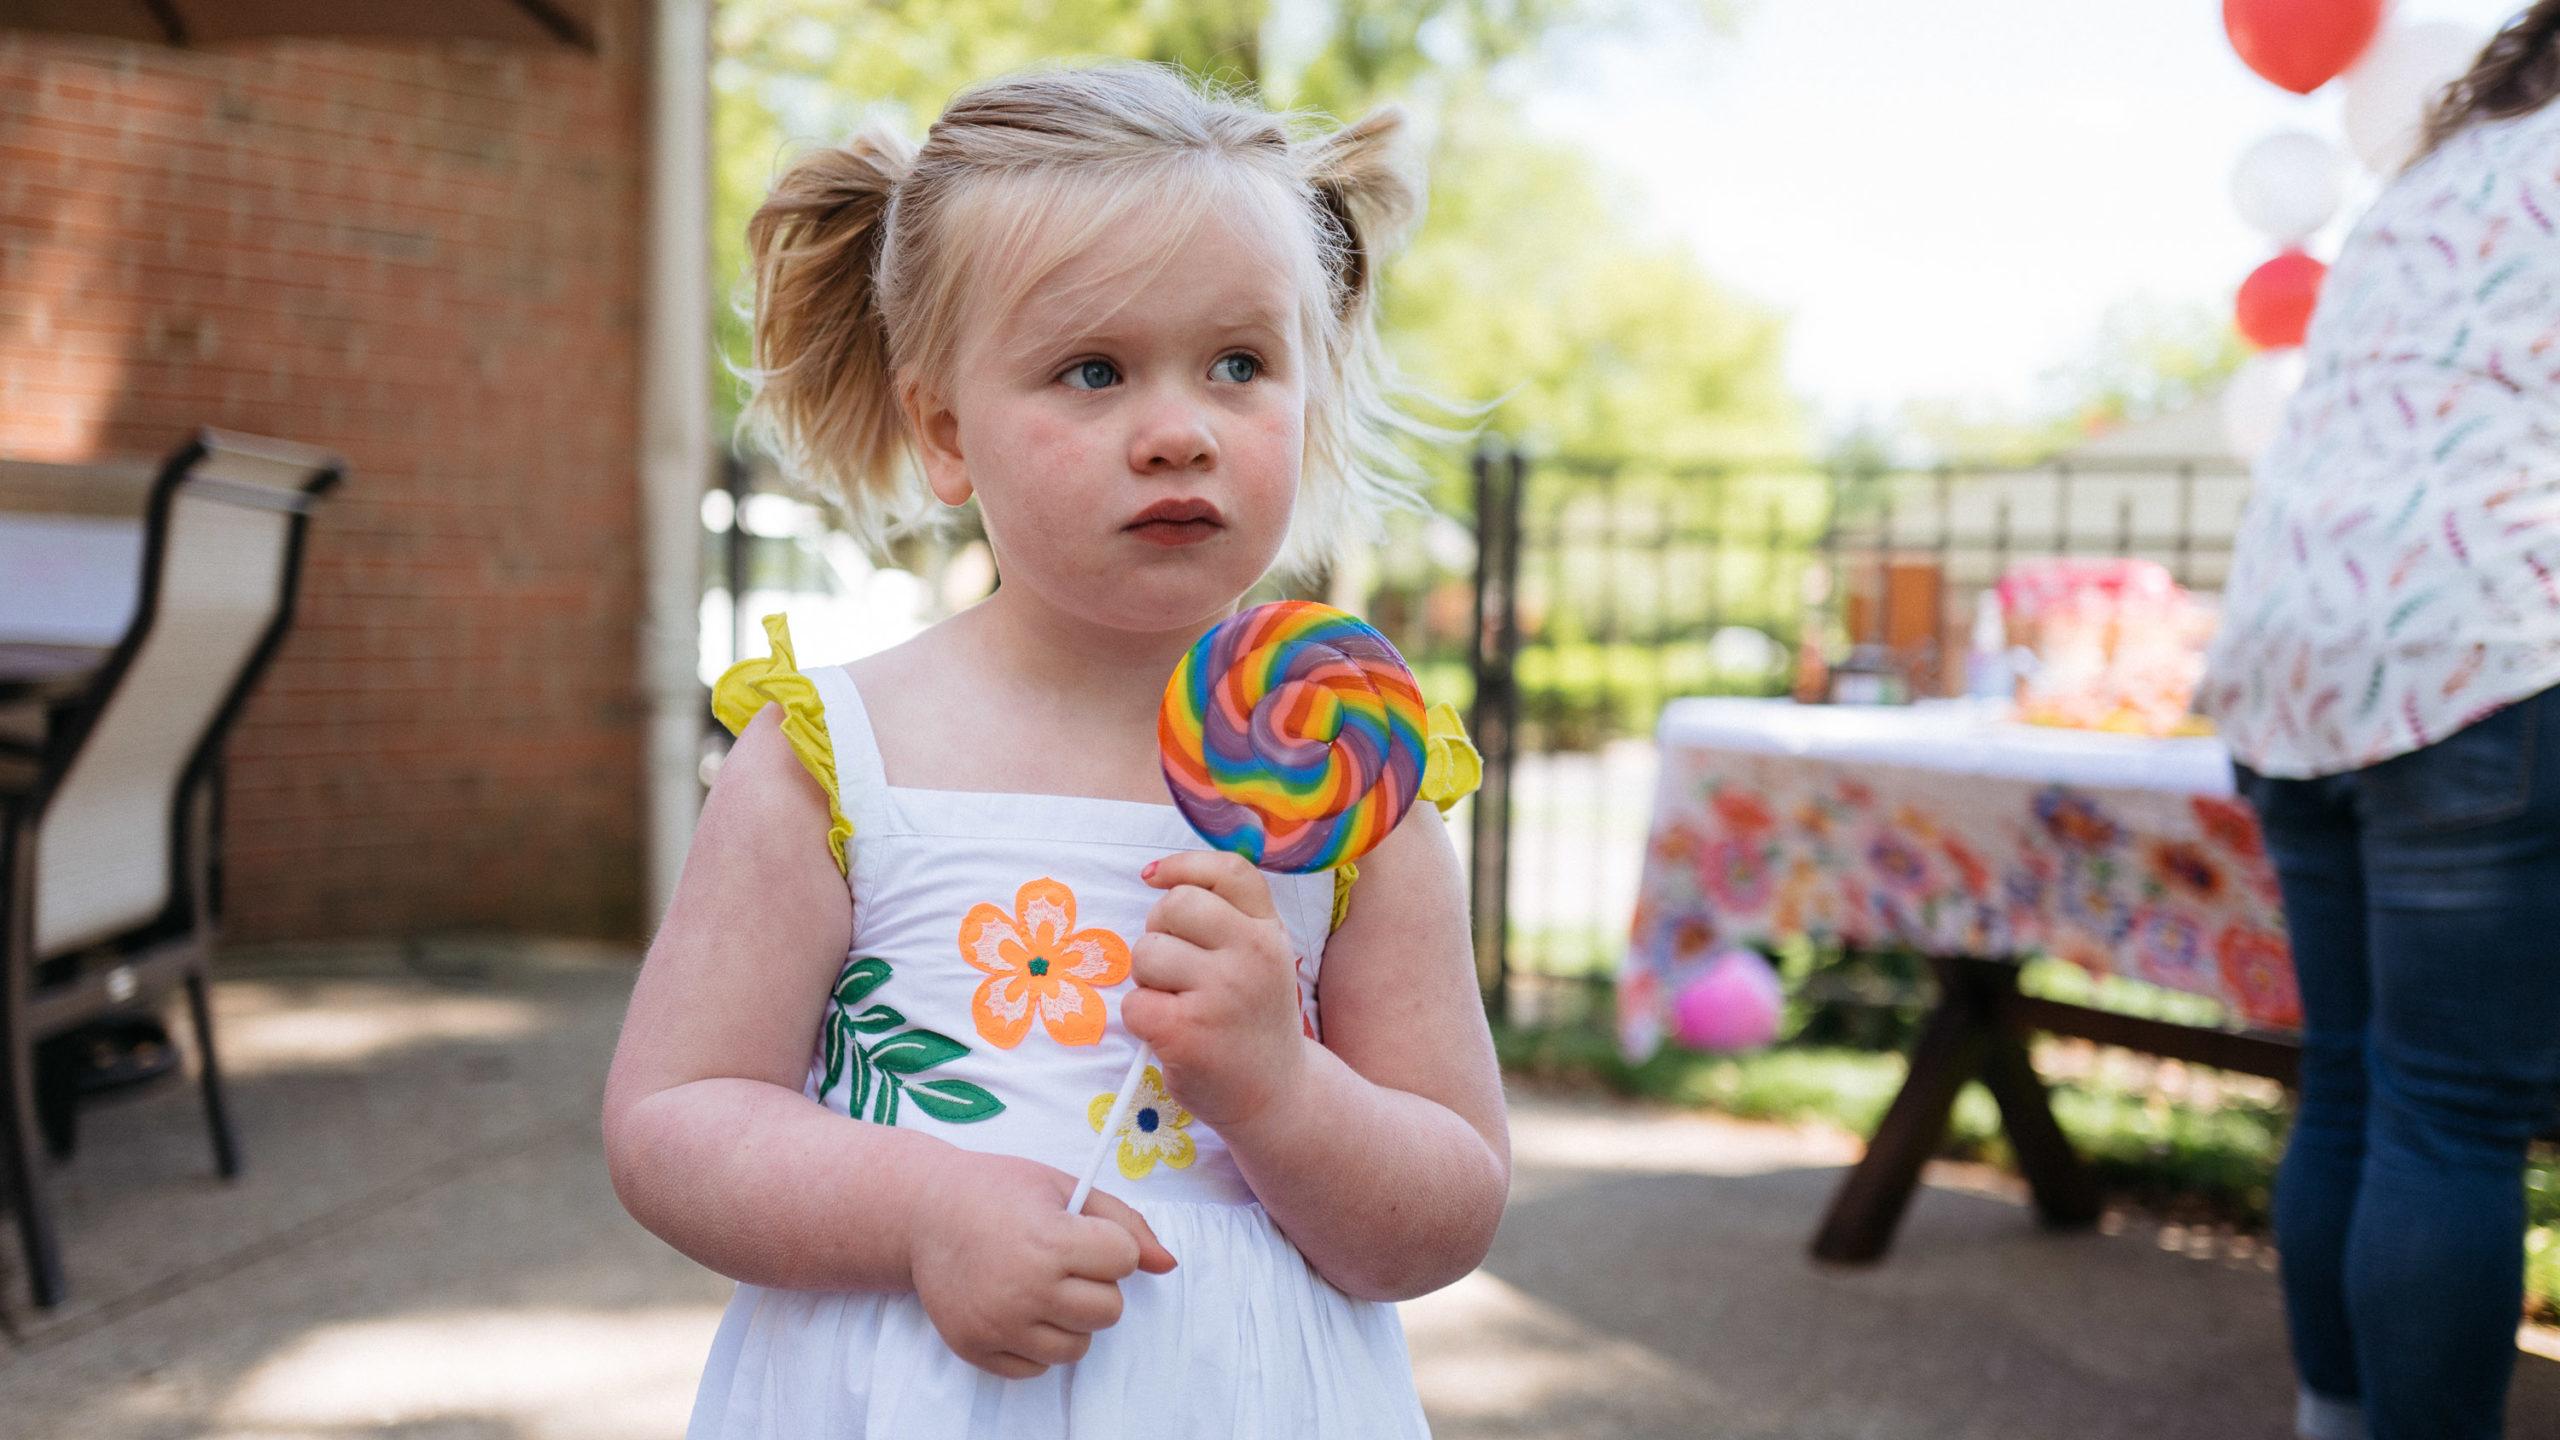 A young girl has a rainbow lollipop and a curious glance